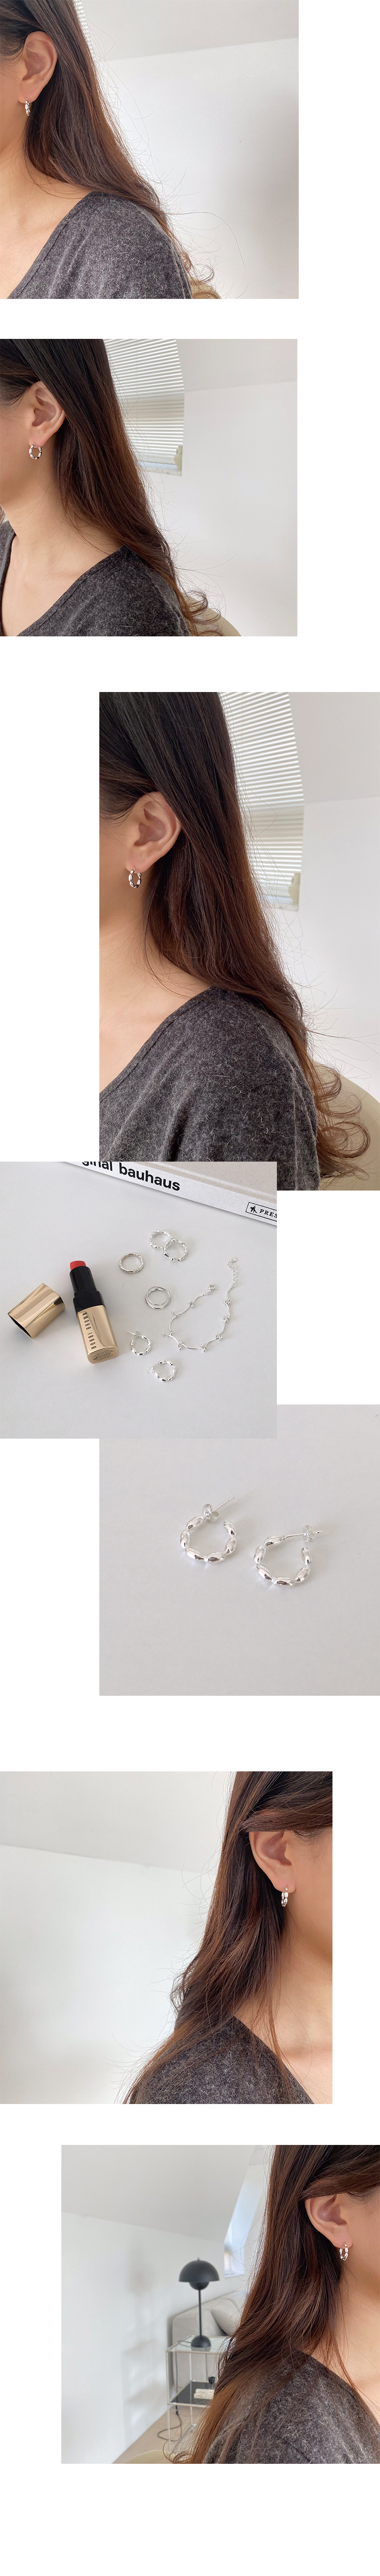 rice earring